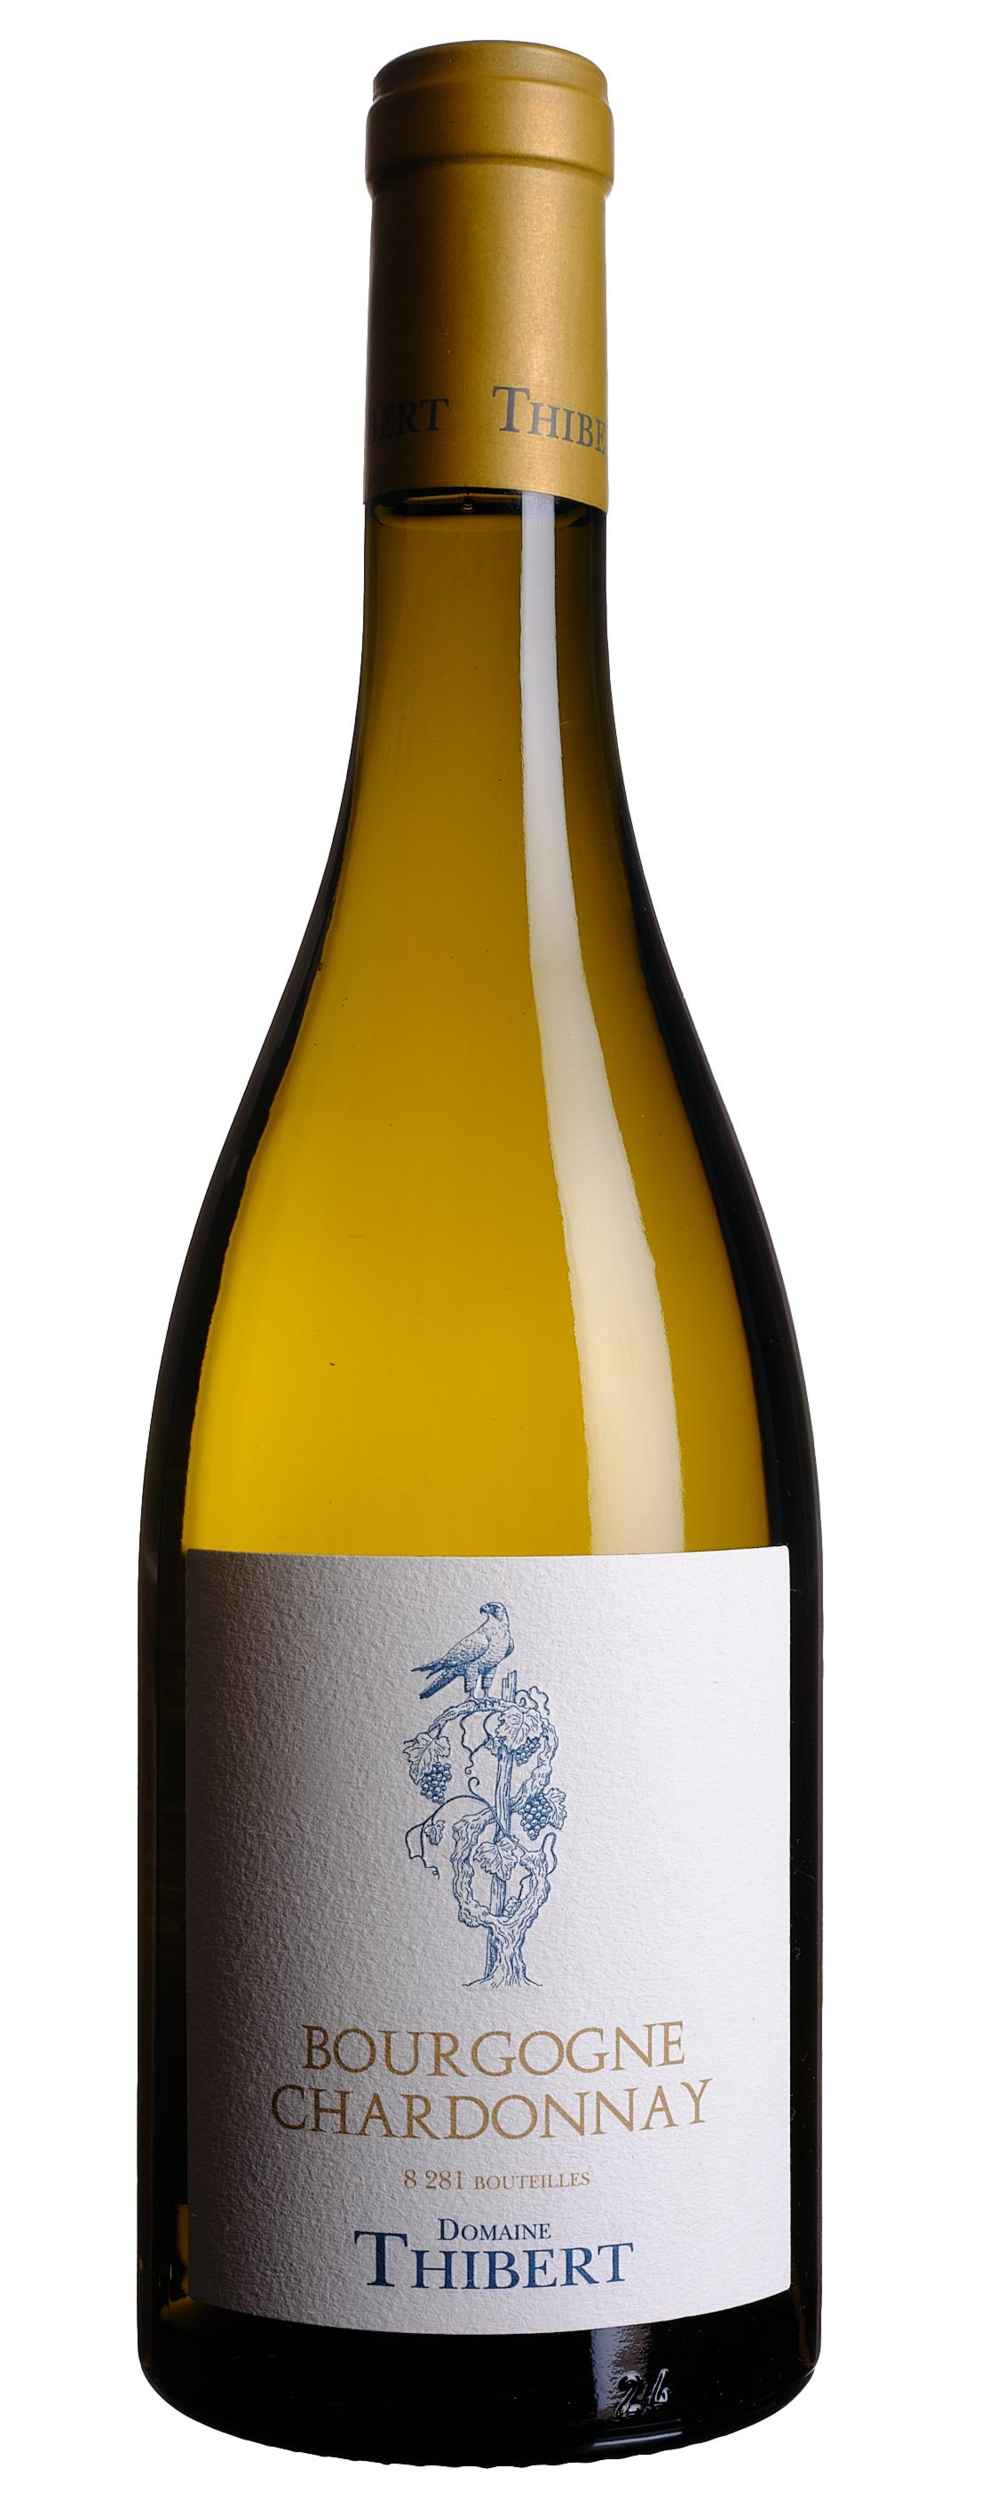 Bourgogne Blanc - Chardonnay - Domaine Thibert - 2017